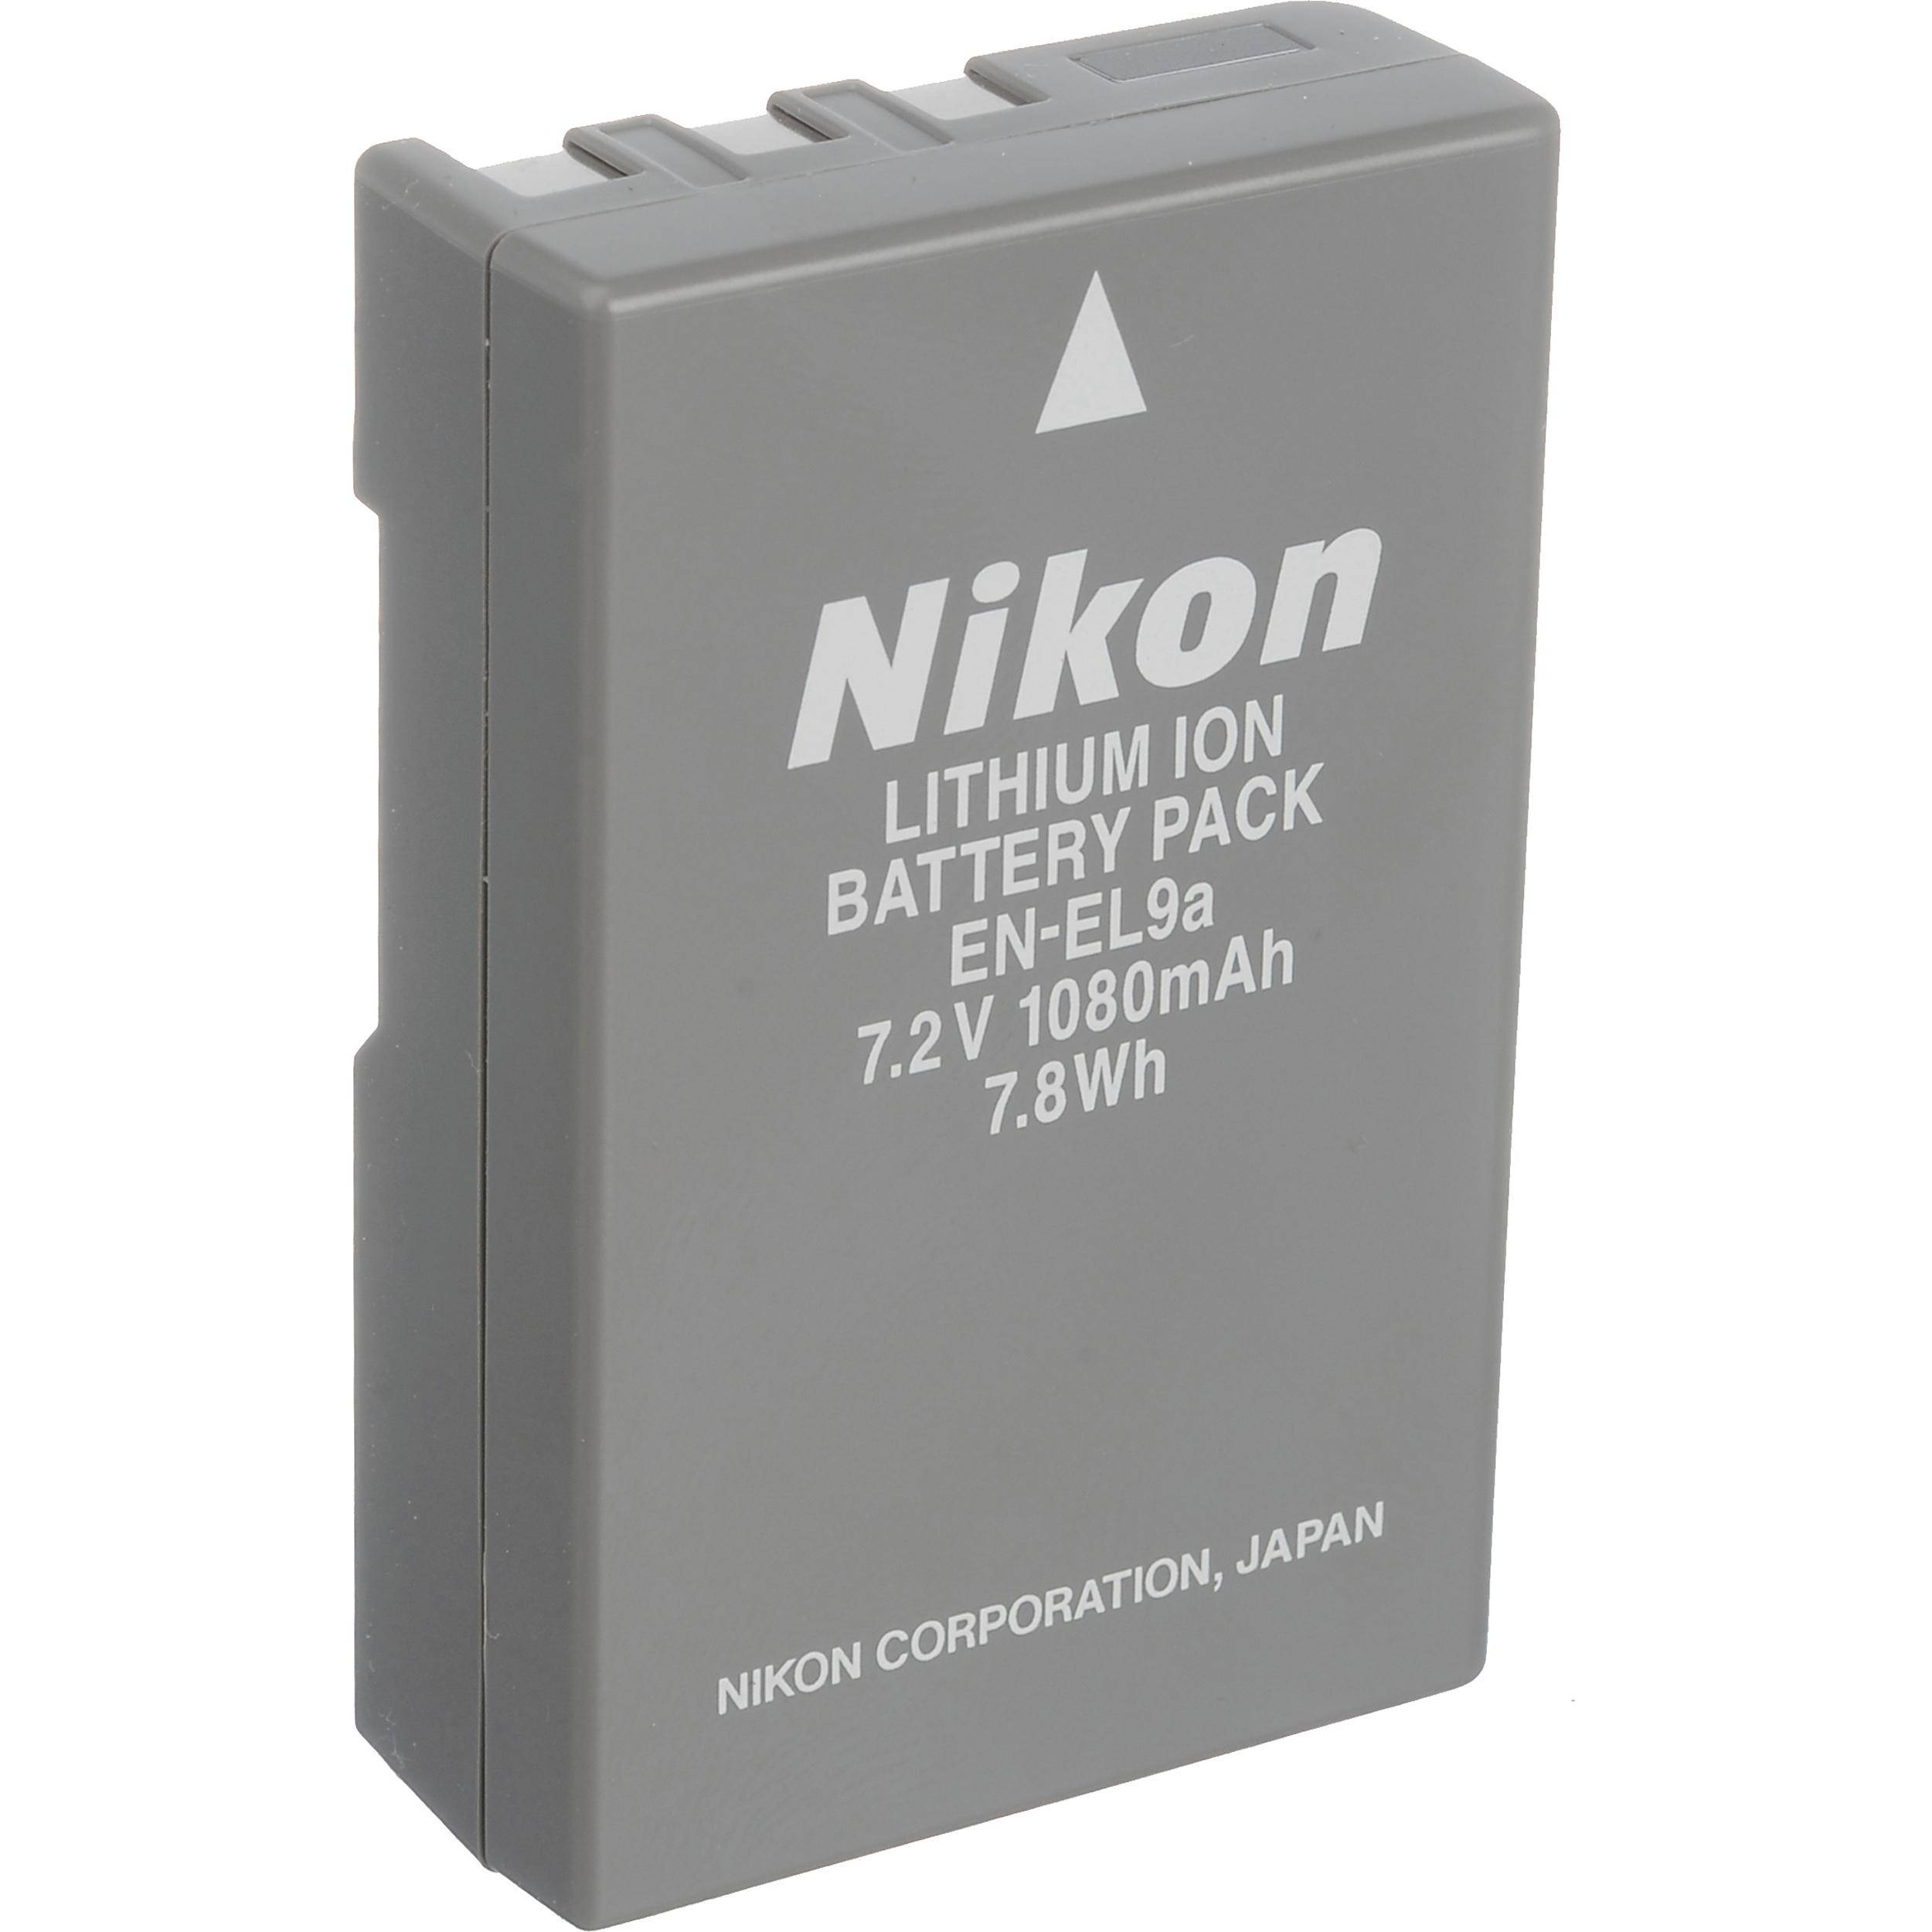 Nikon EN-EL9A LI-ION Rechargeable Battery